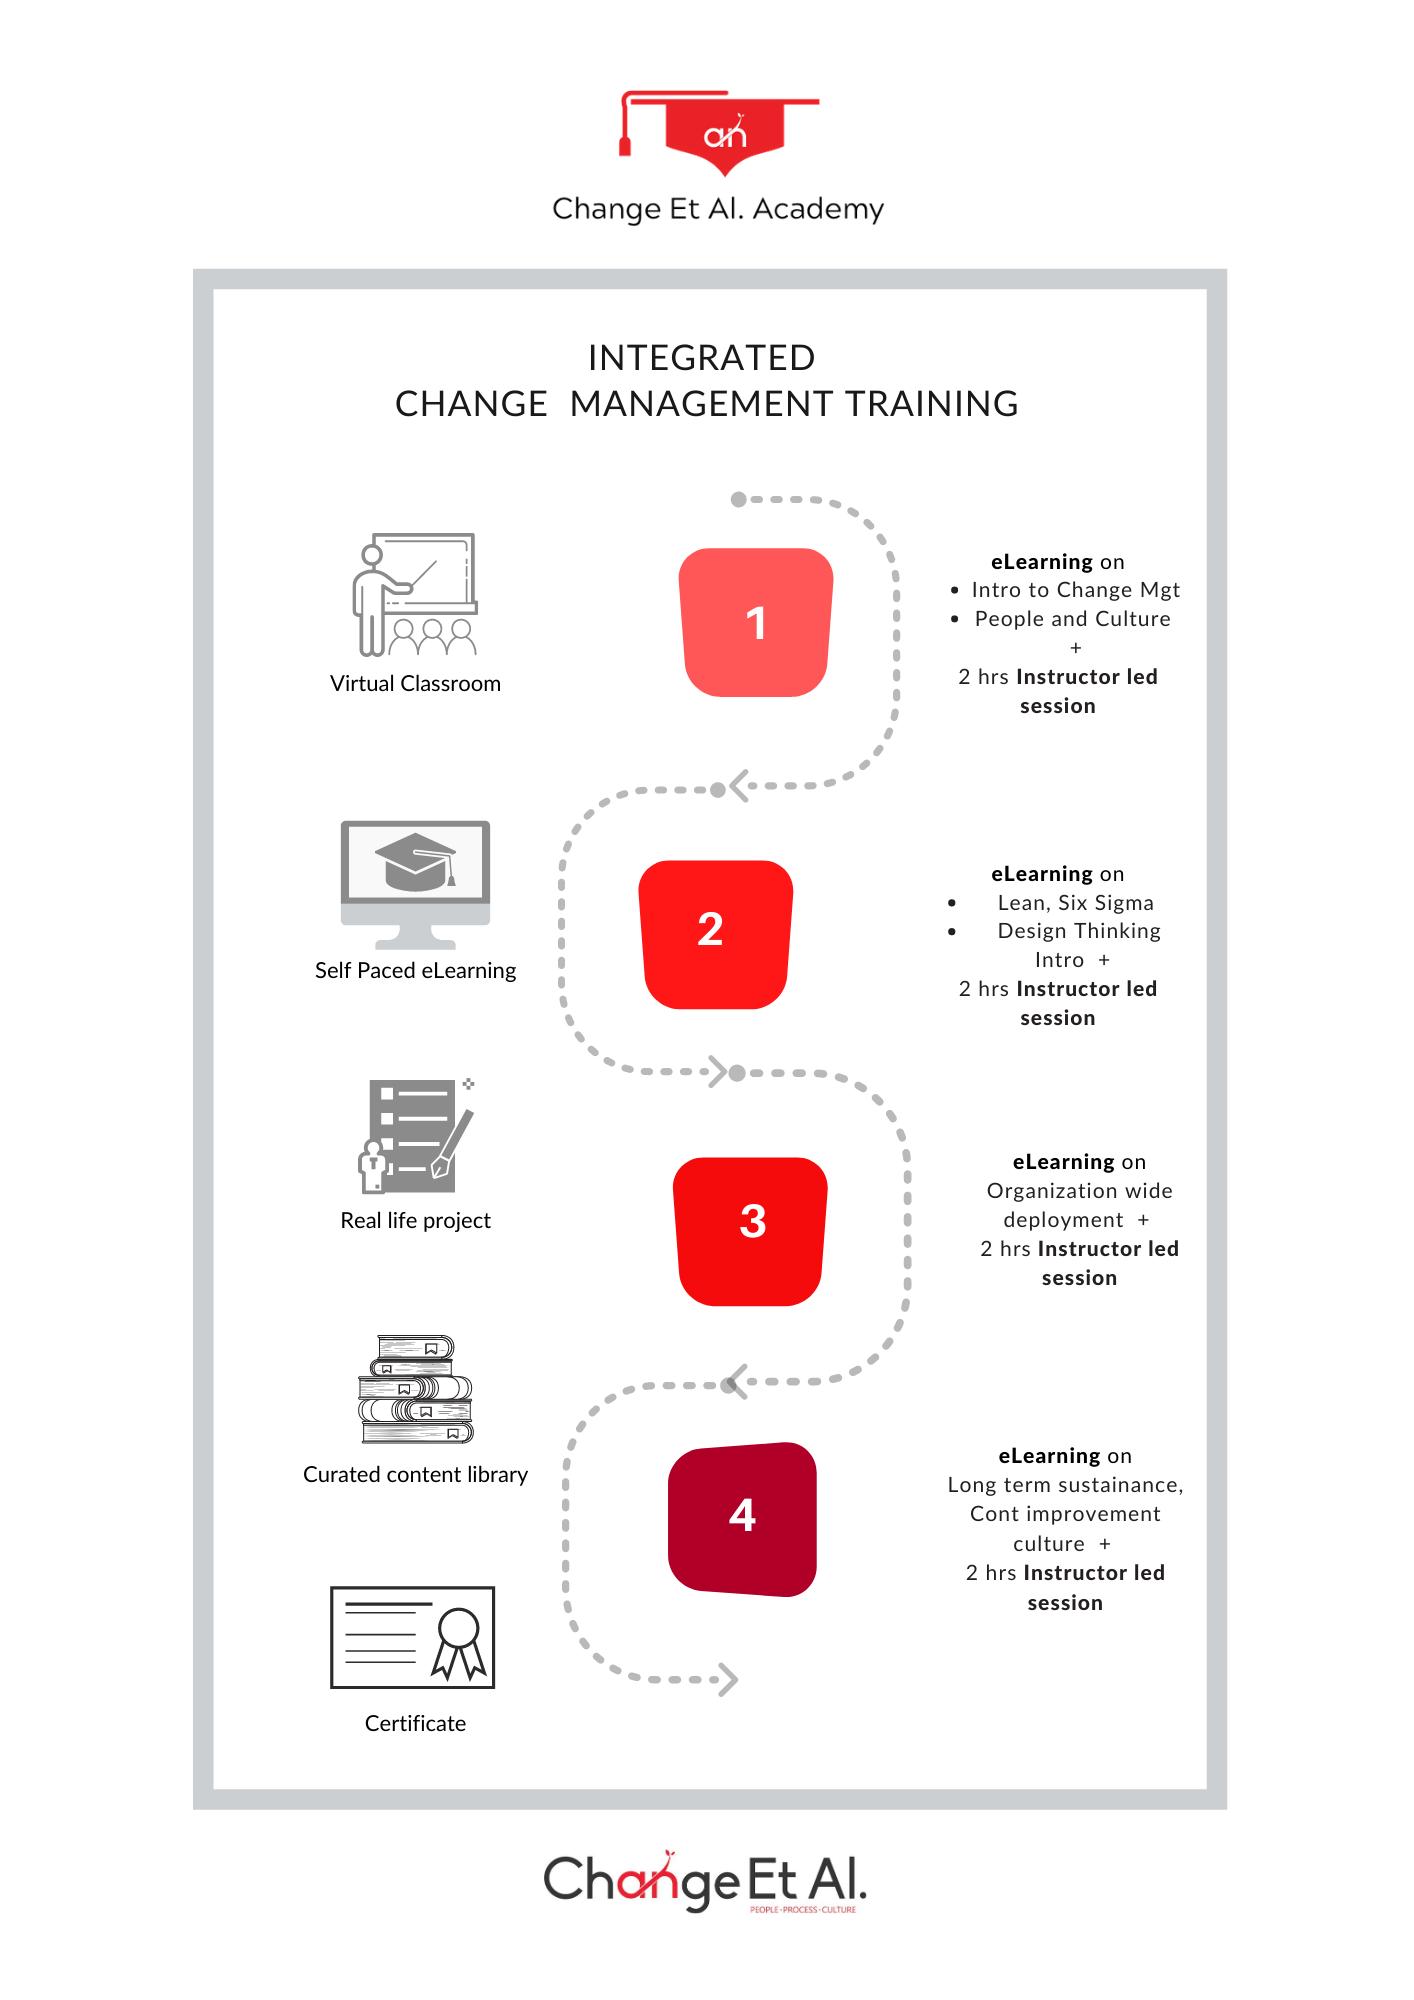 Integrated Change Management Training plan